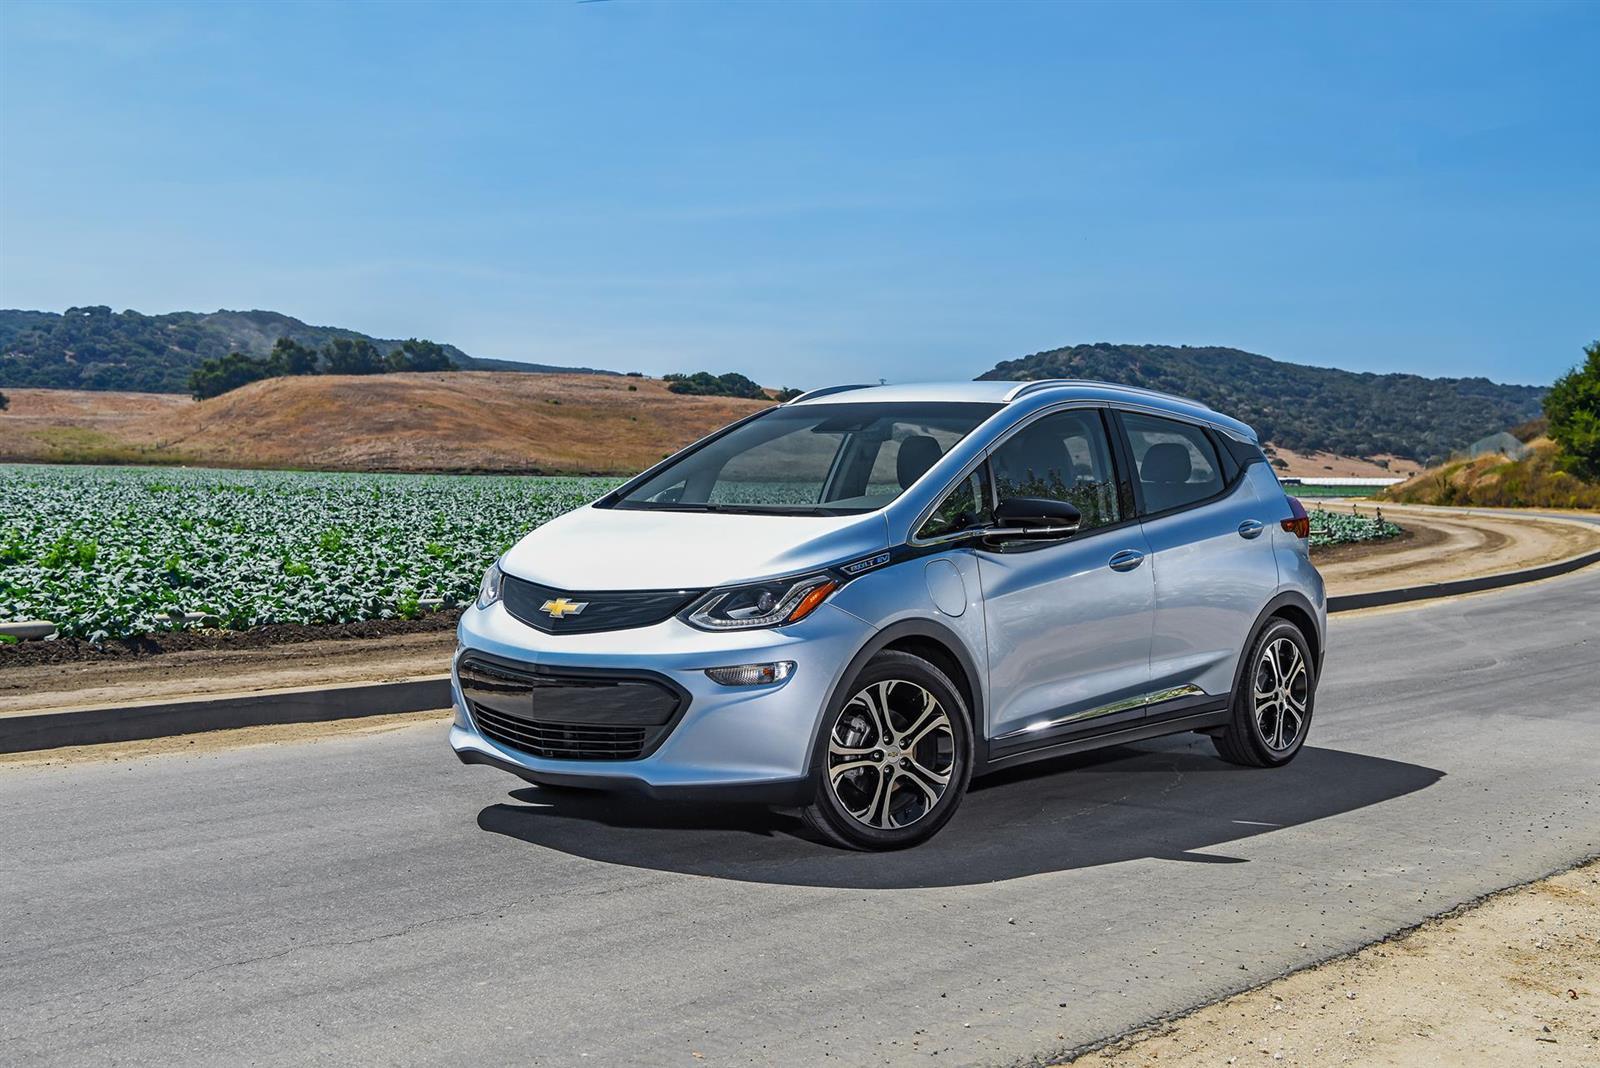 http://www.conceptcarz.com/images/Chevrolet/2017-Chevy-Bolt-driving-range-025-1600.jpg